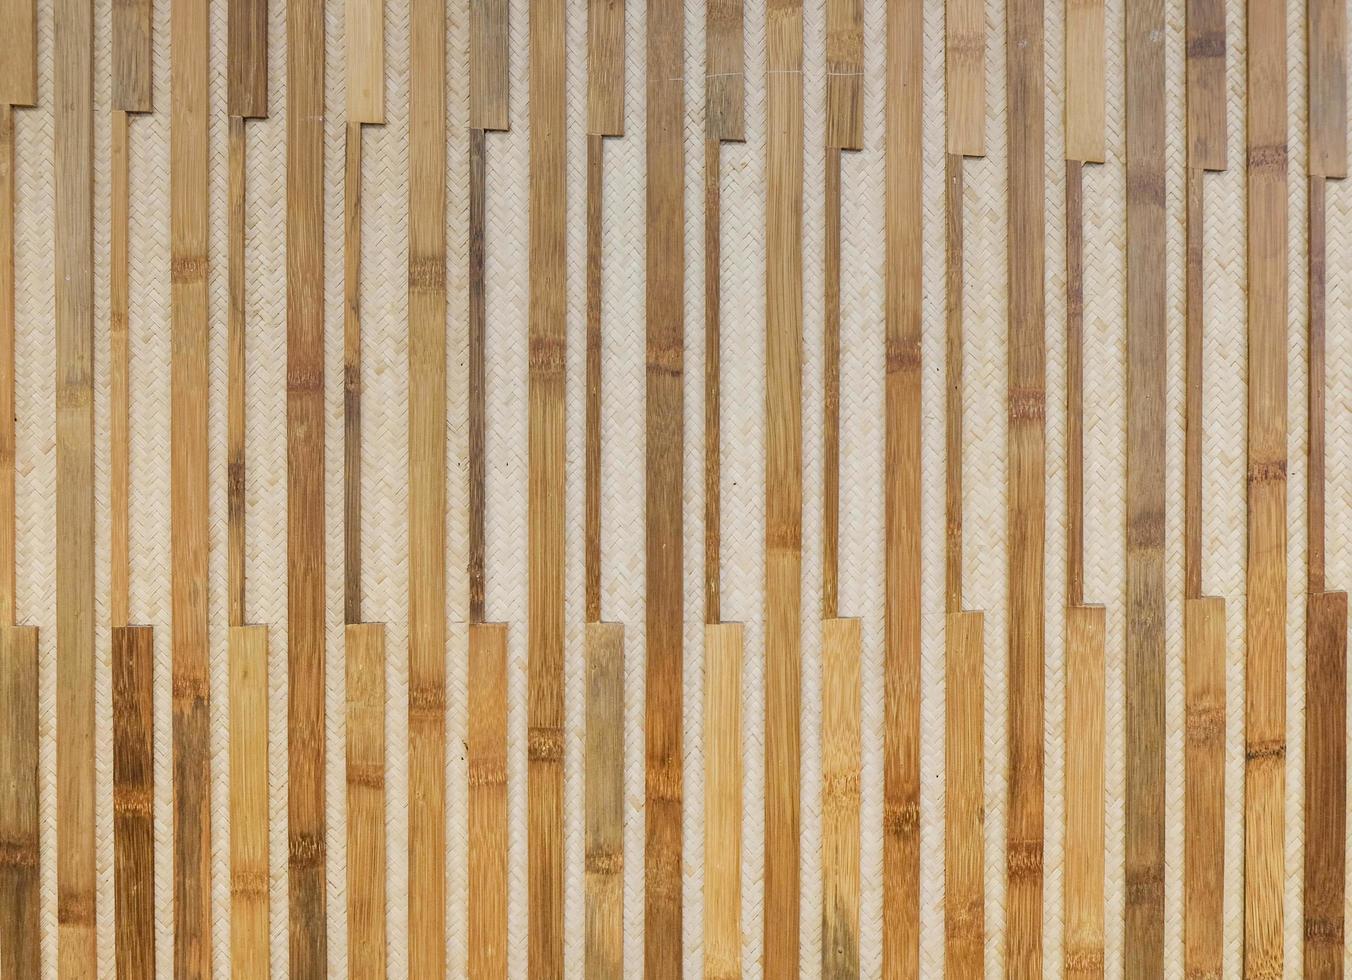 prancha de bambu velho tom marrom foto